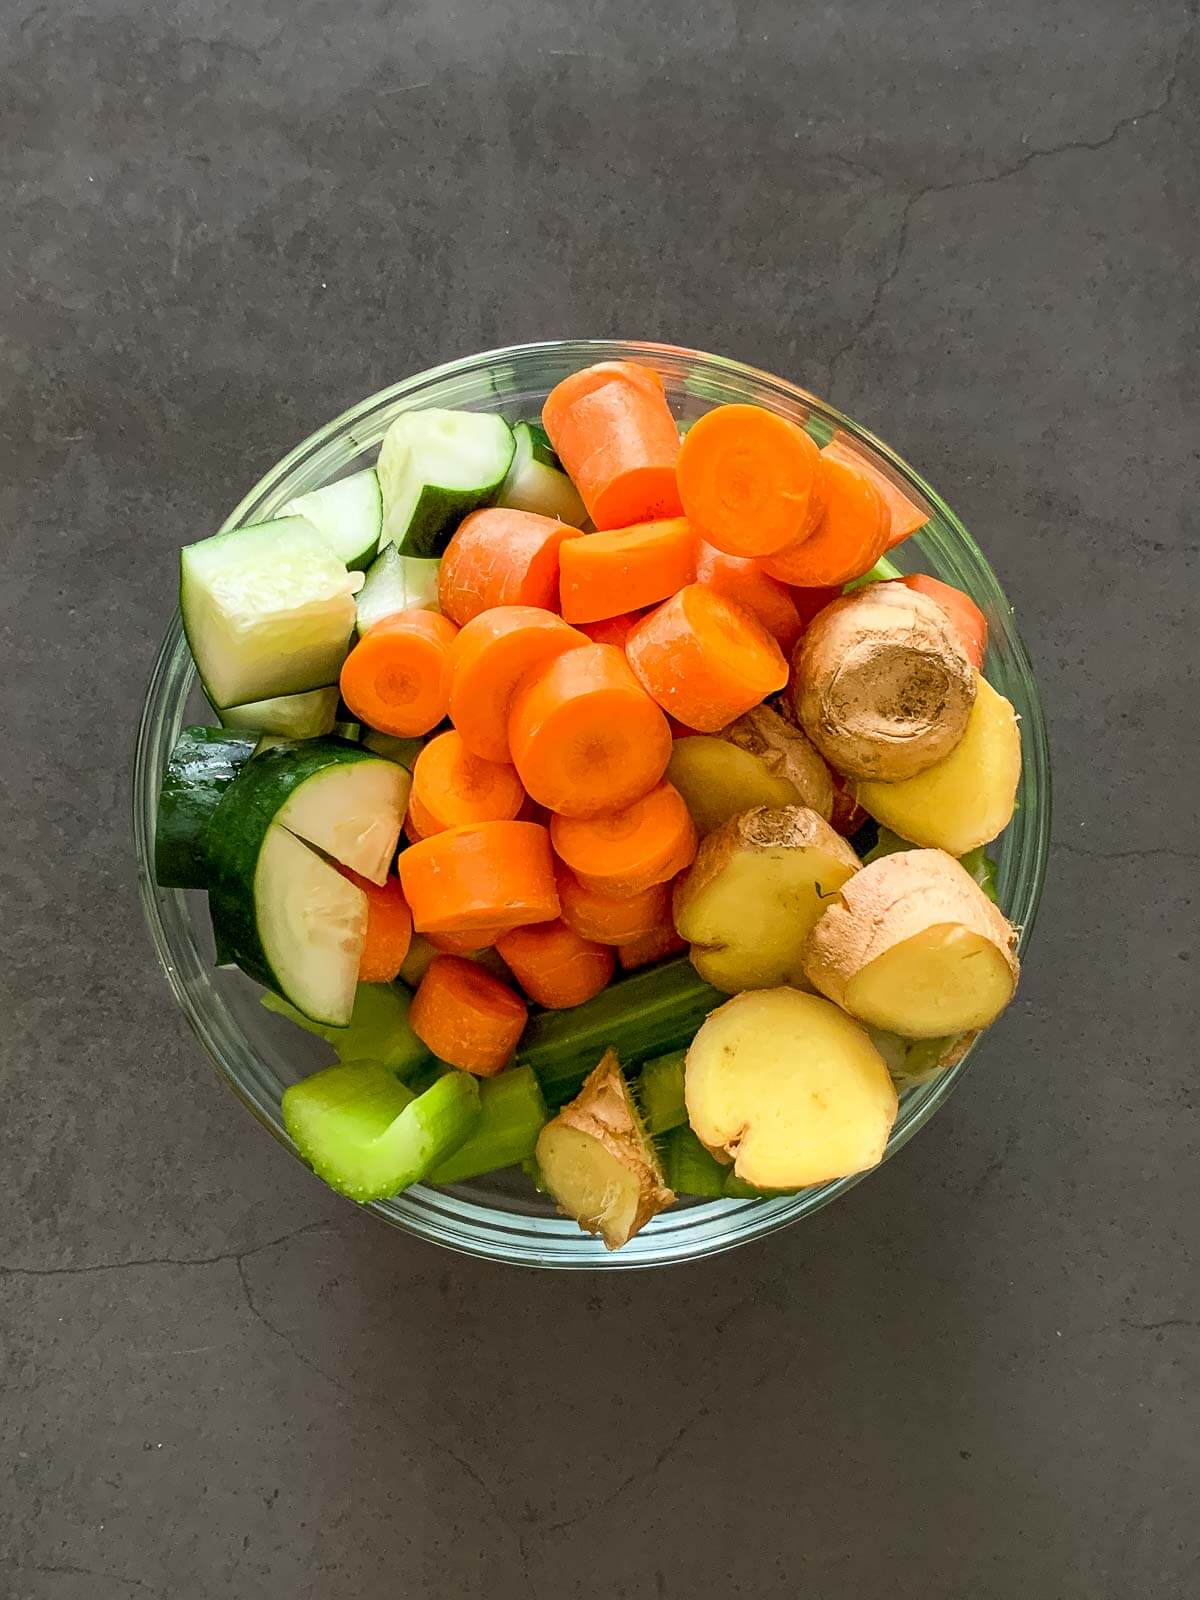 carrot celery cucumber juice ingredients in bowl